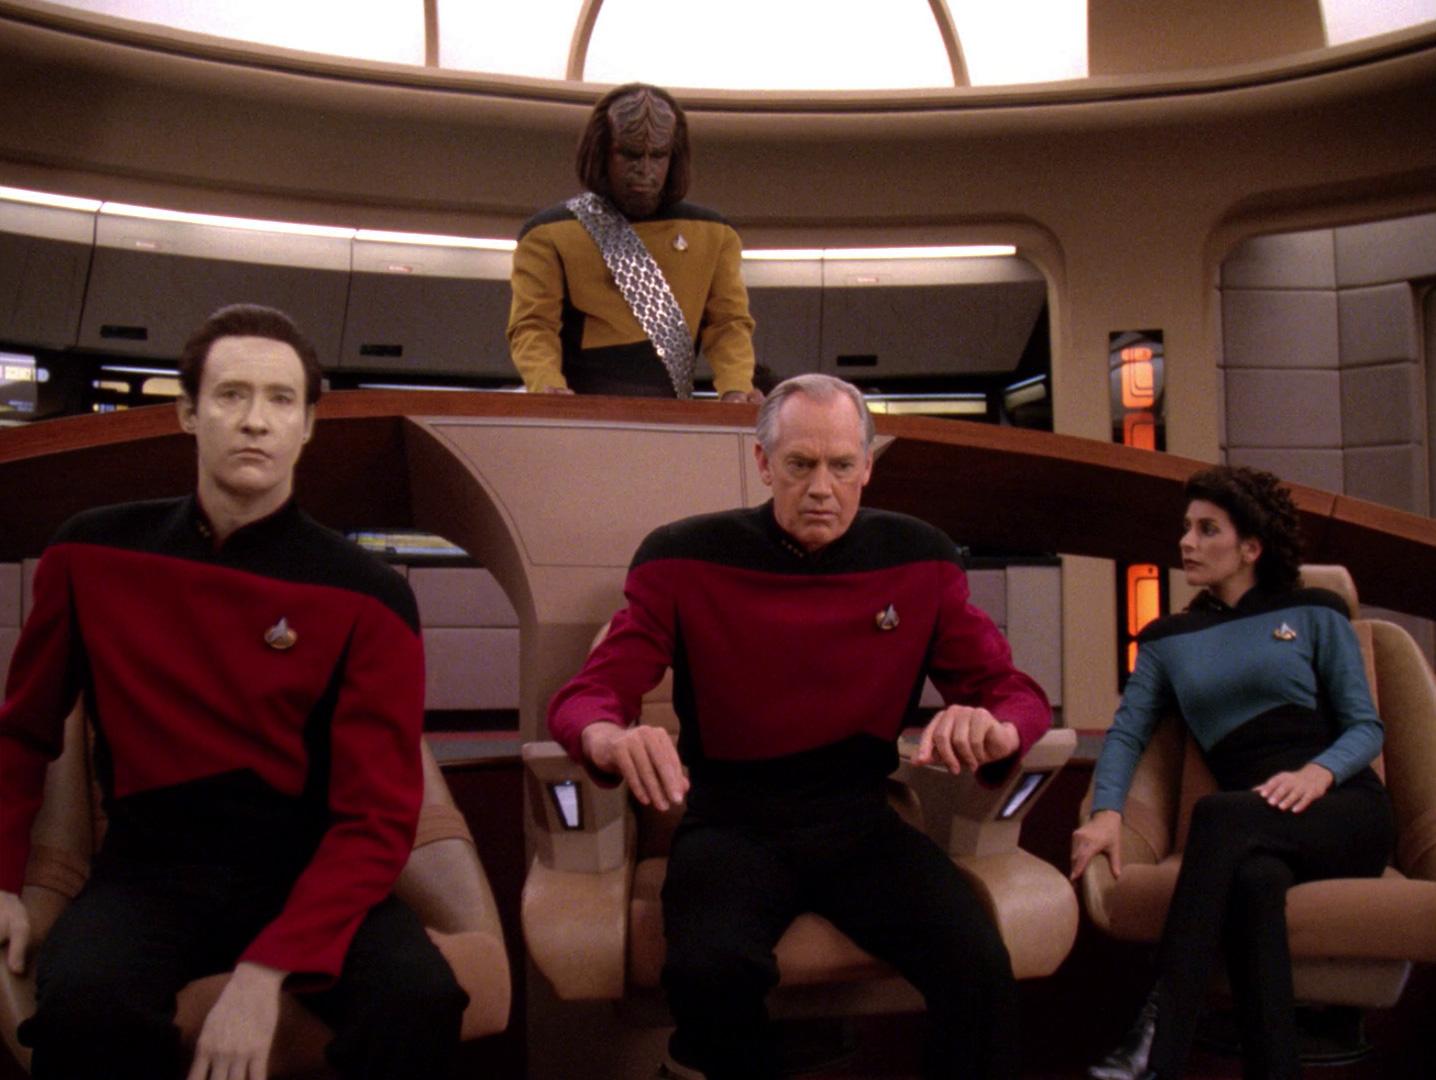 Captain Jellico kommandiert die Enterprise.jpg